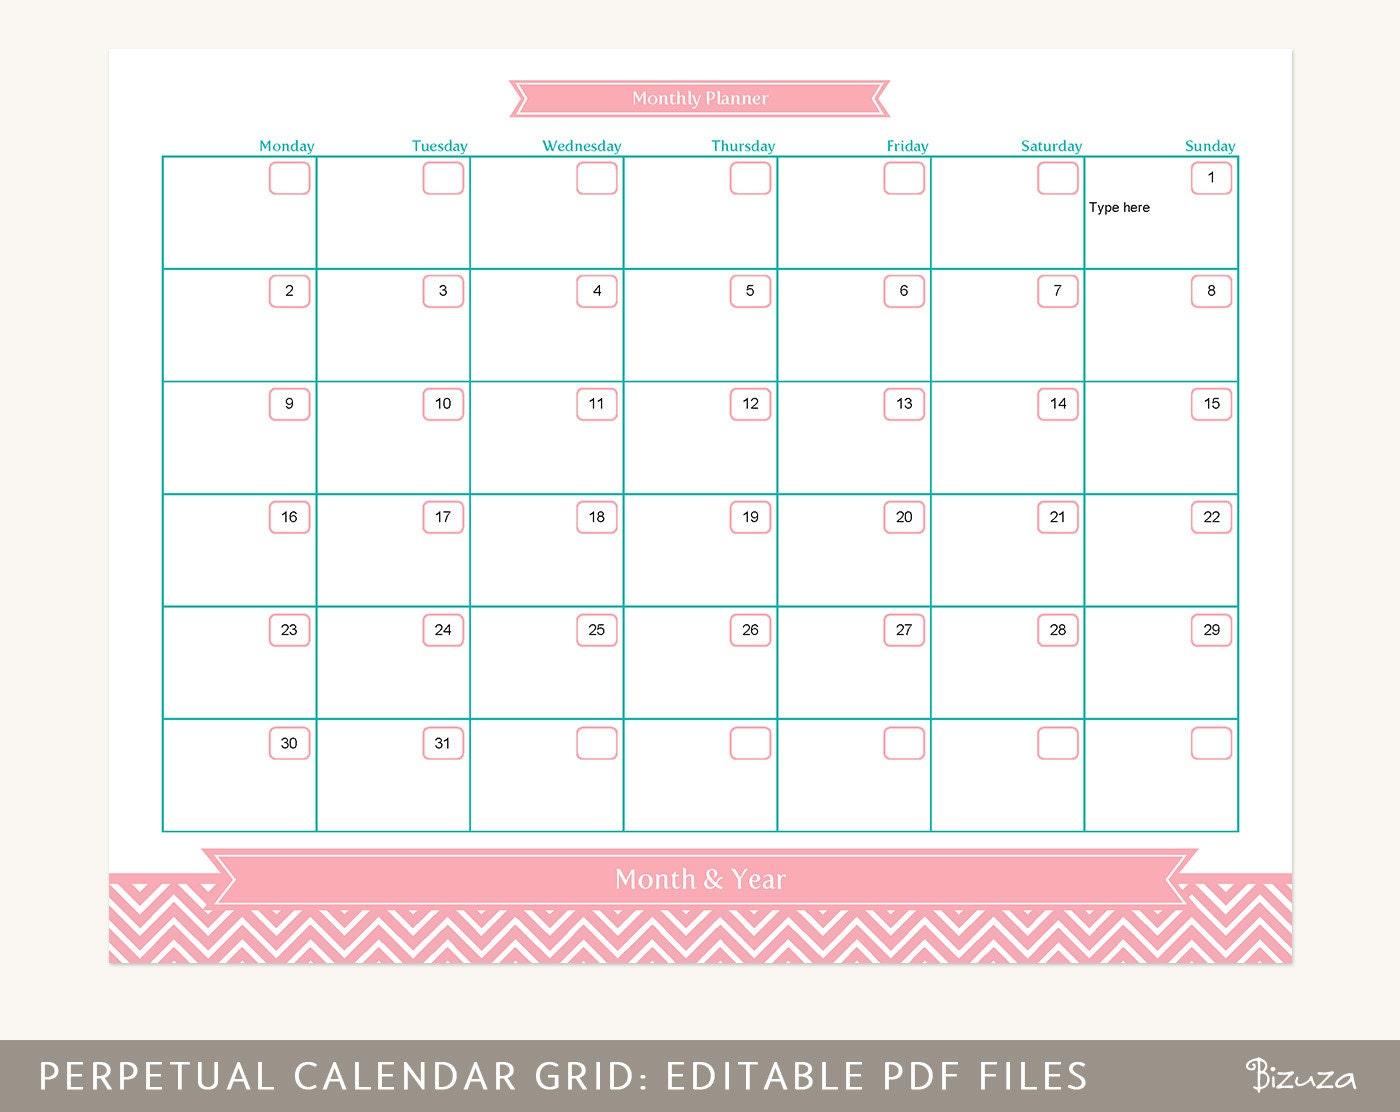 Monthly Calendar Grid : Calendar planner grid month at a glance printable editable